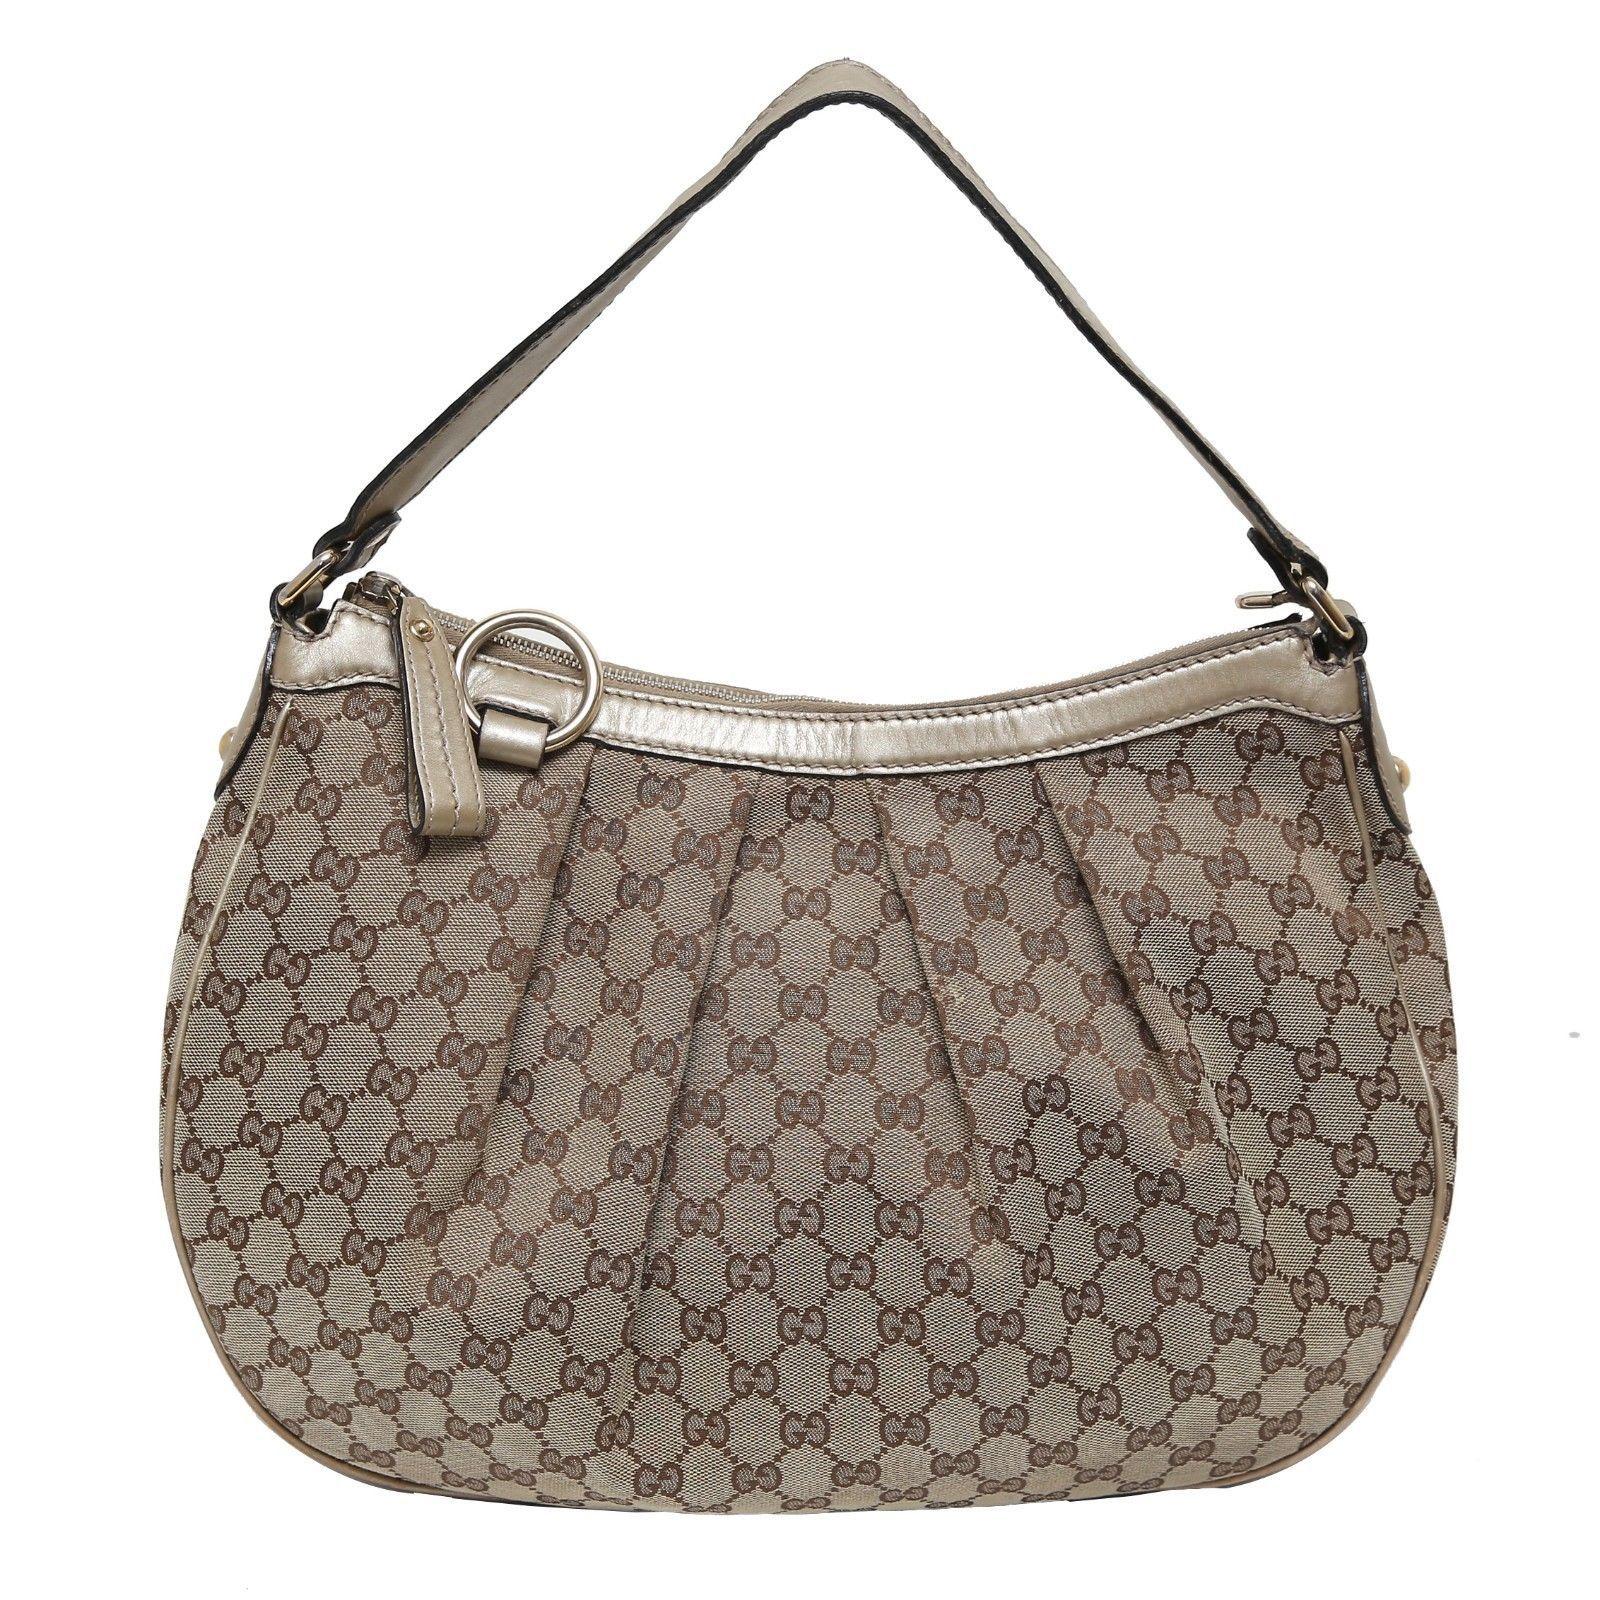 660bfb32b6e 57. 57. Previous. Auth Gucci Beige GG Monogram Canvas Sukey Hobo Leather  Trim Handbag MSRP 945